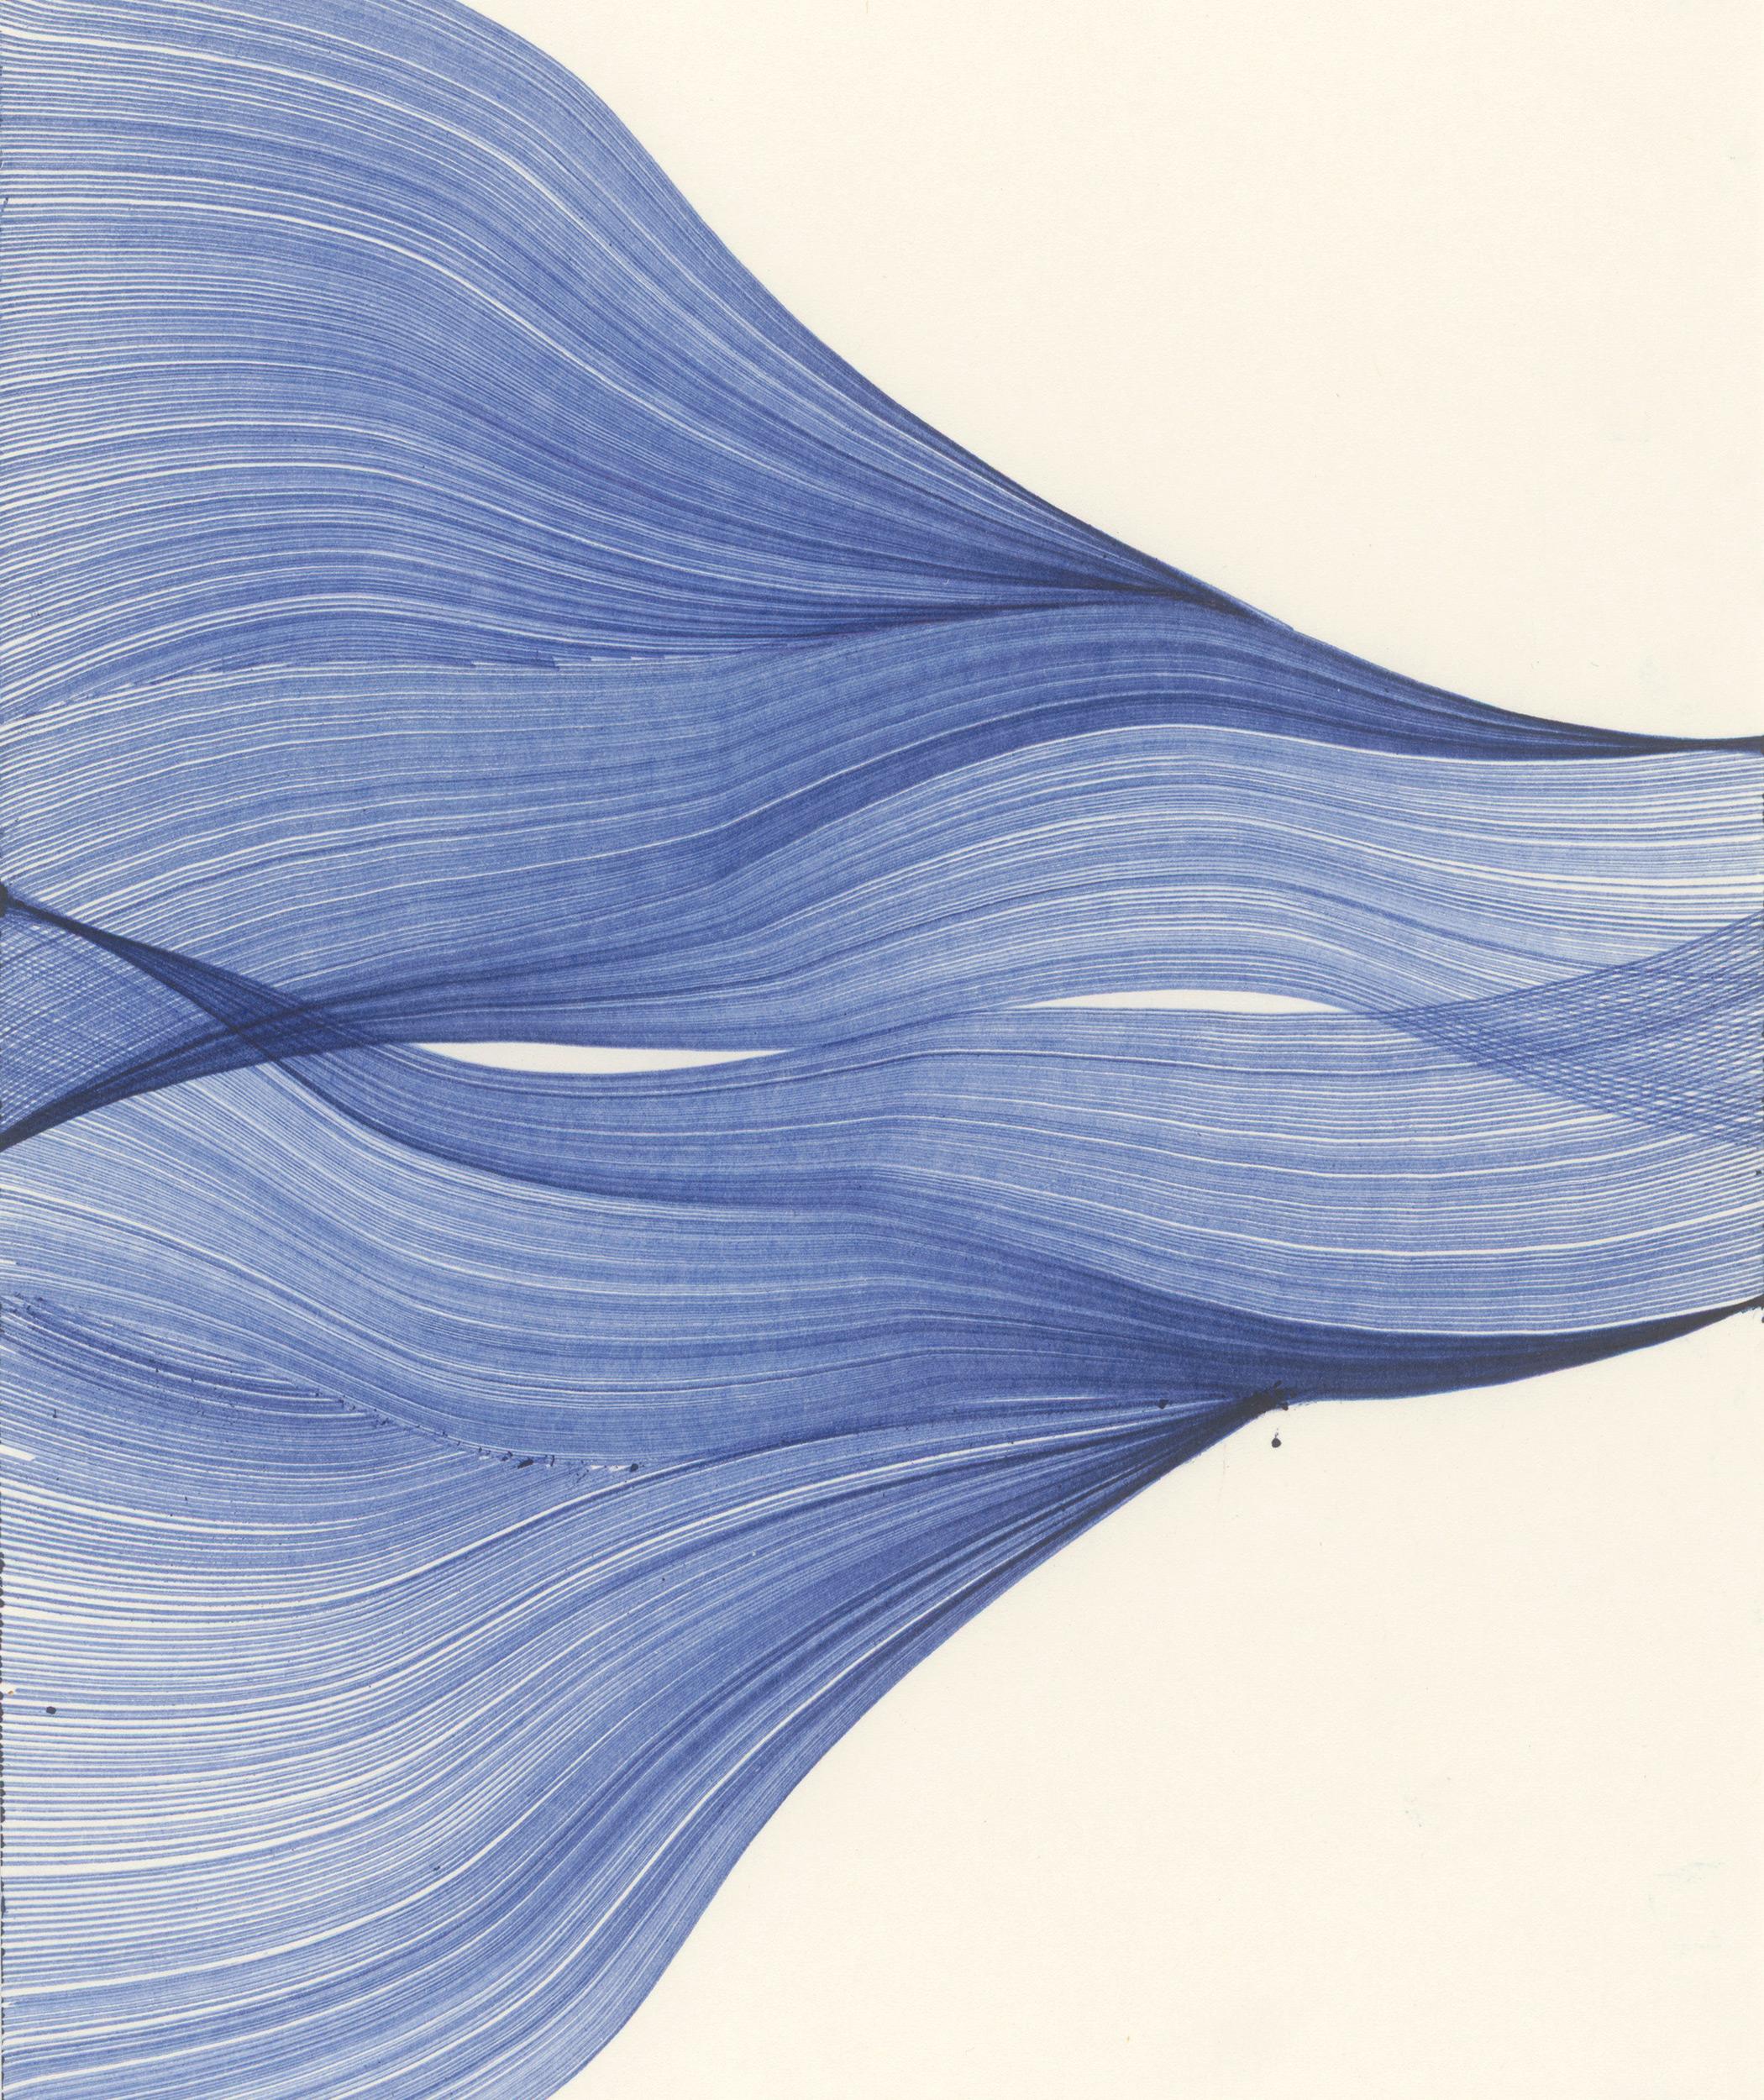 Thomas Müller (*1959) Ohne Titel, 2007 Kugelschreiber, 29,7 x 21 cm